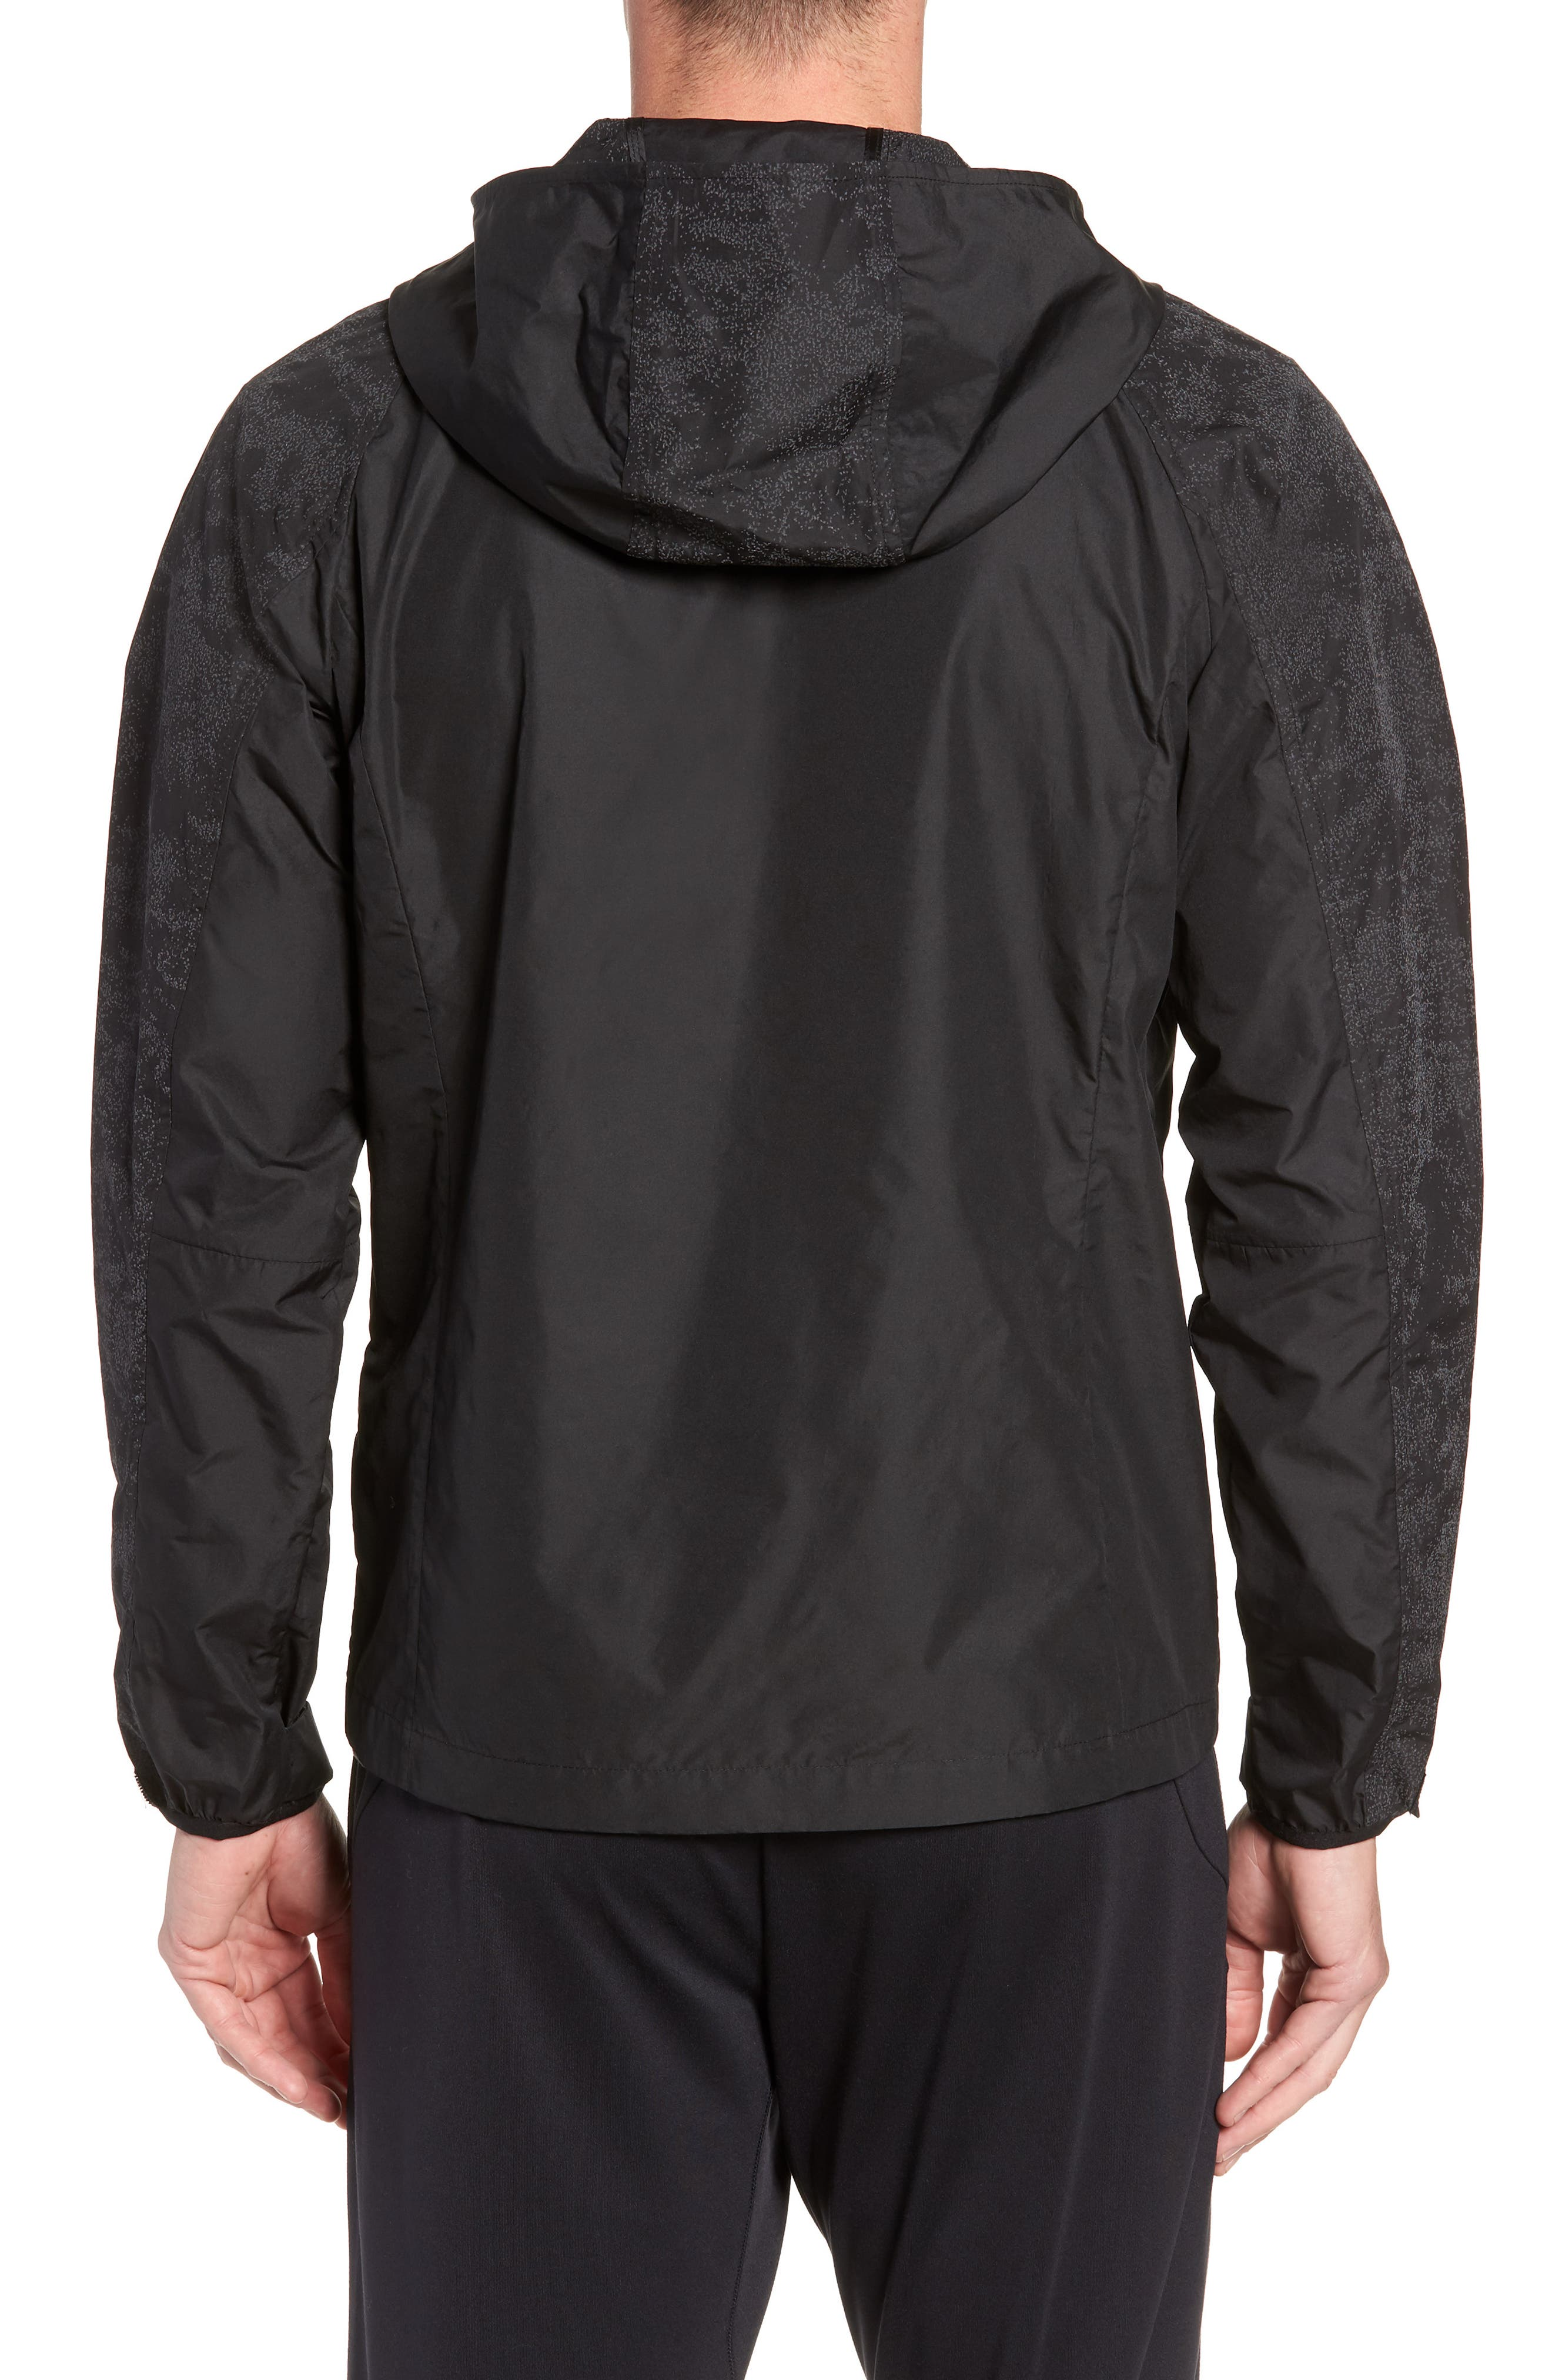 Hooded Reflective Jacket,                             Alternate thumbnail 2, color,                             BLACK REFLECTIVE